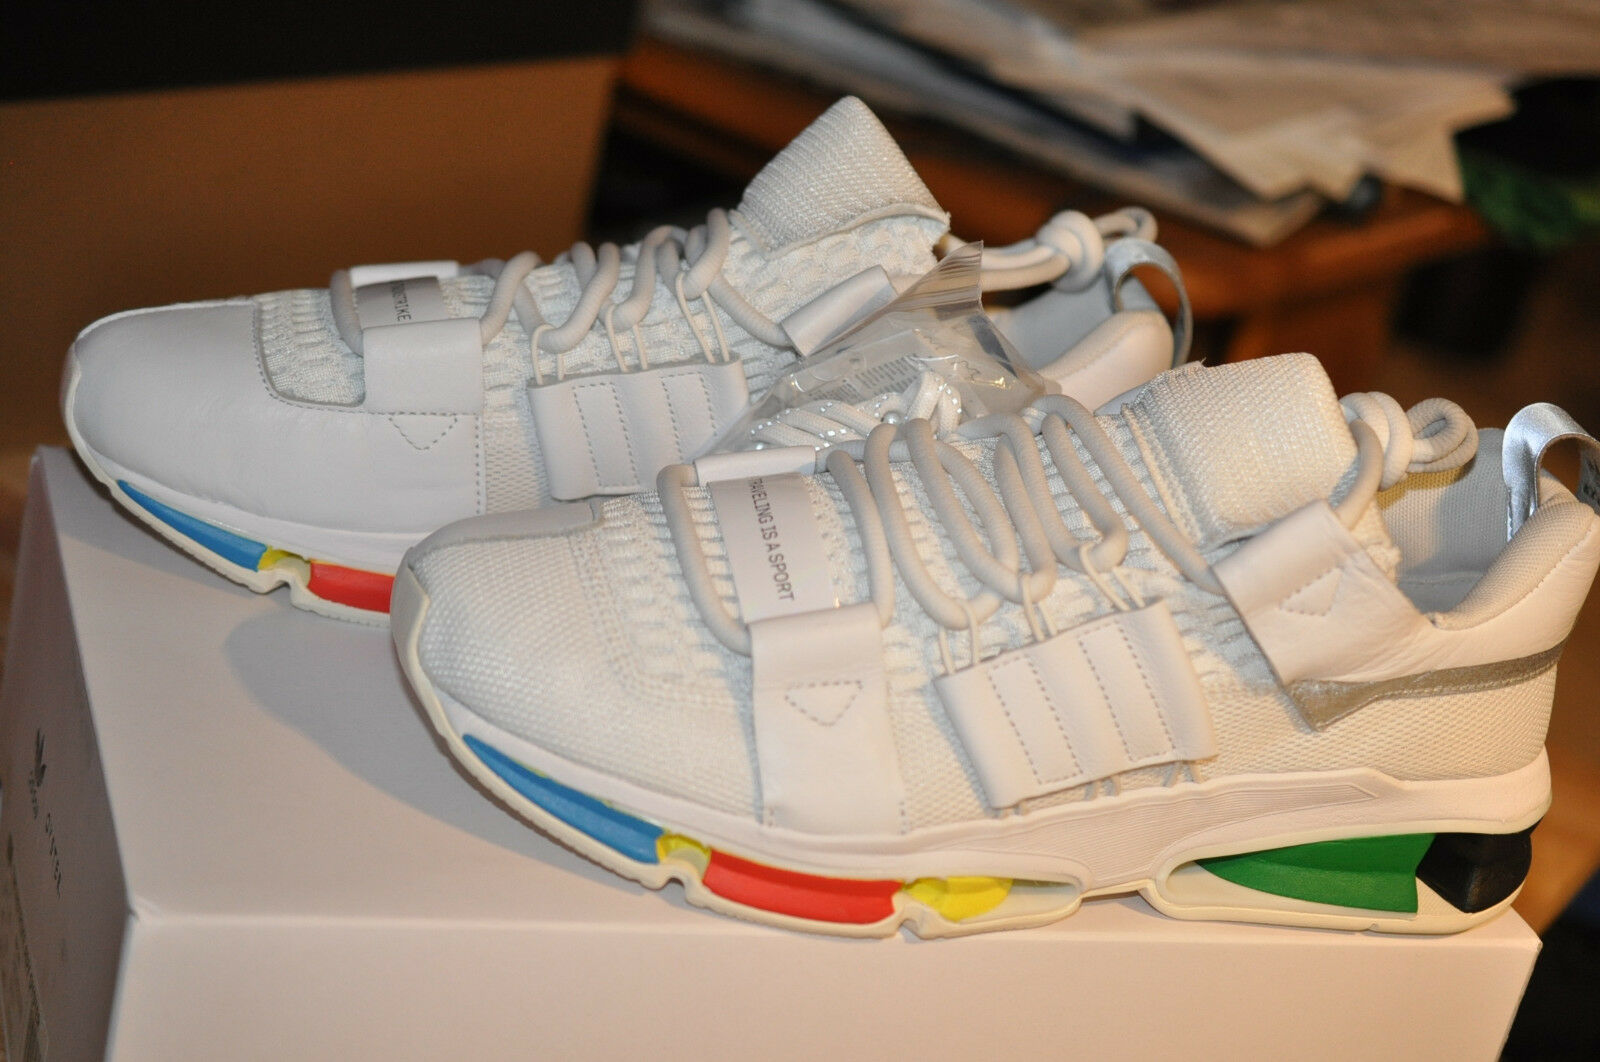 Adidas originals TWINSTRIKE ADV OYSTER Weiß US11.5 UK11 EUR11 Softbag Deadstock